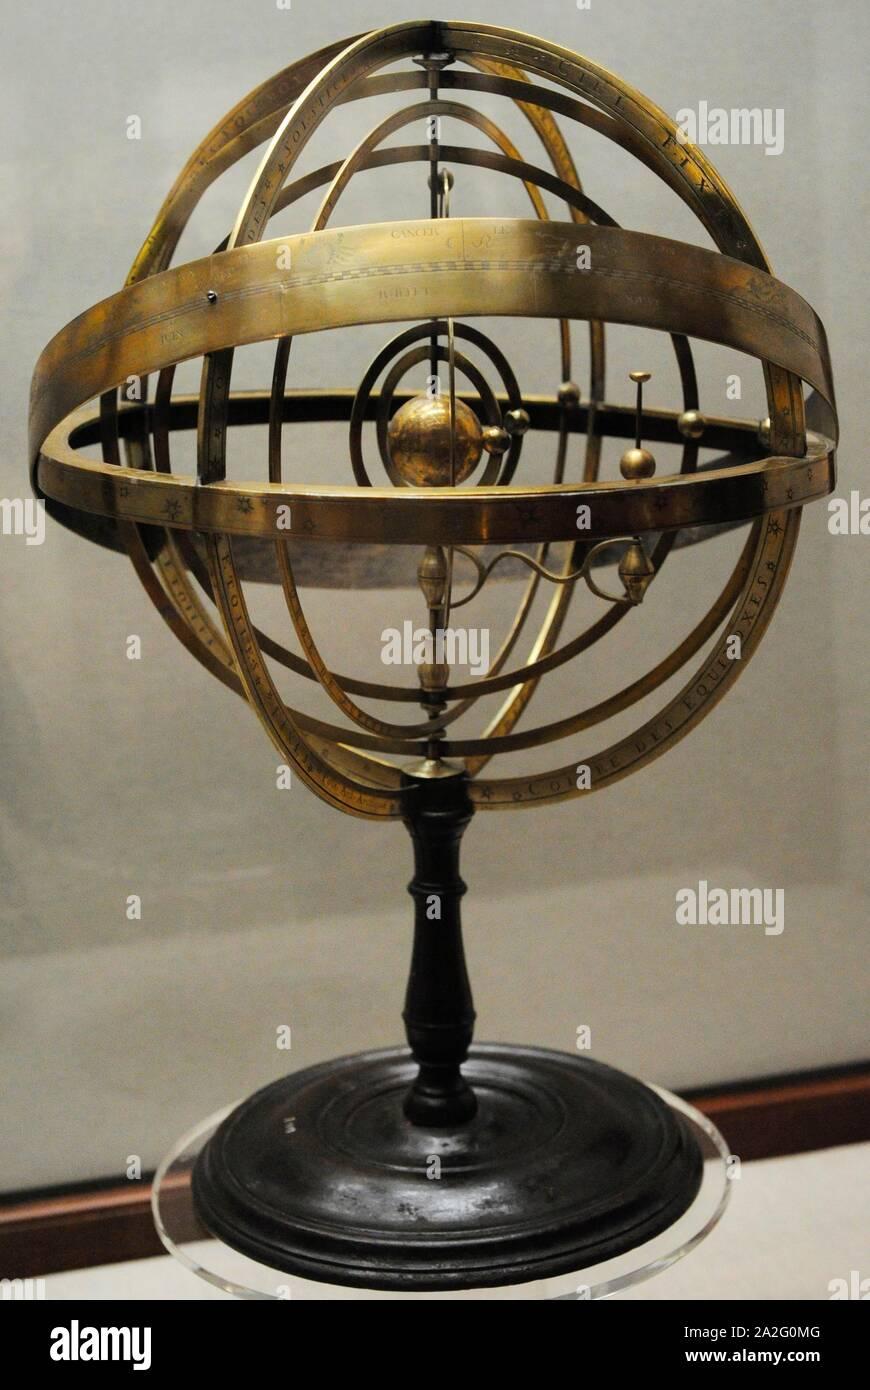 Esfera armilar. Siglos XVII-XVIII. Latón. Museo Naval. Madrid. España. Foto de stock